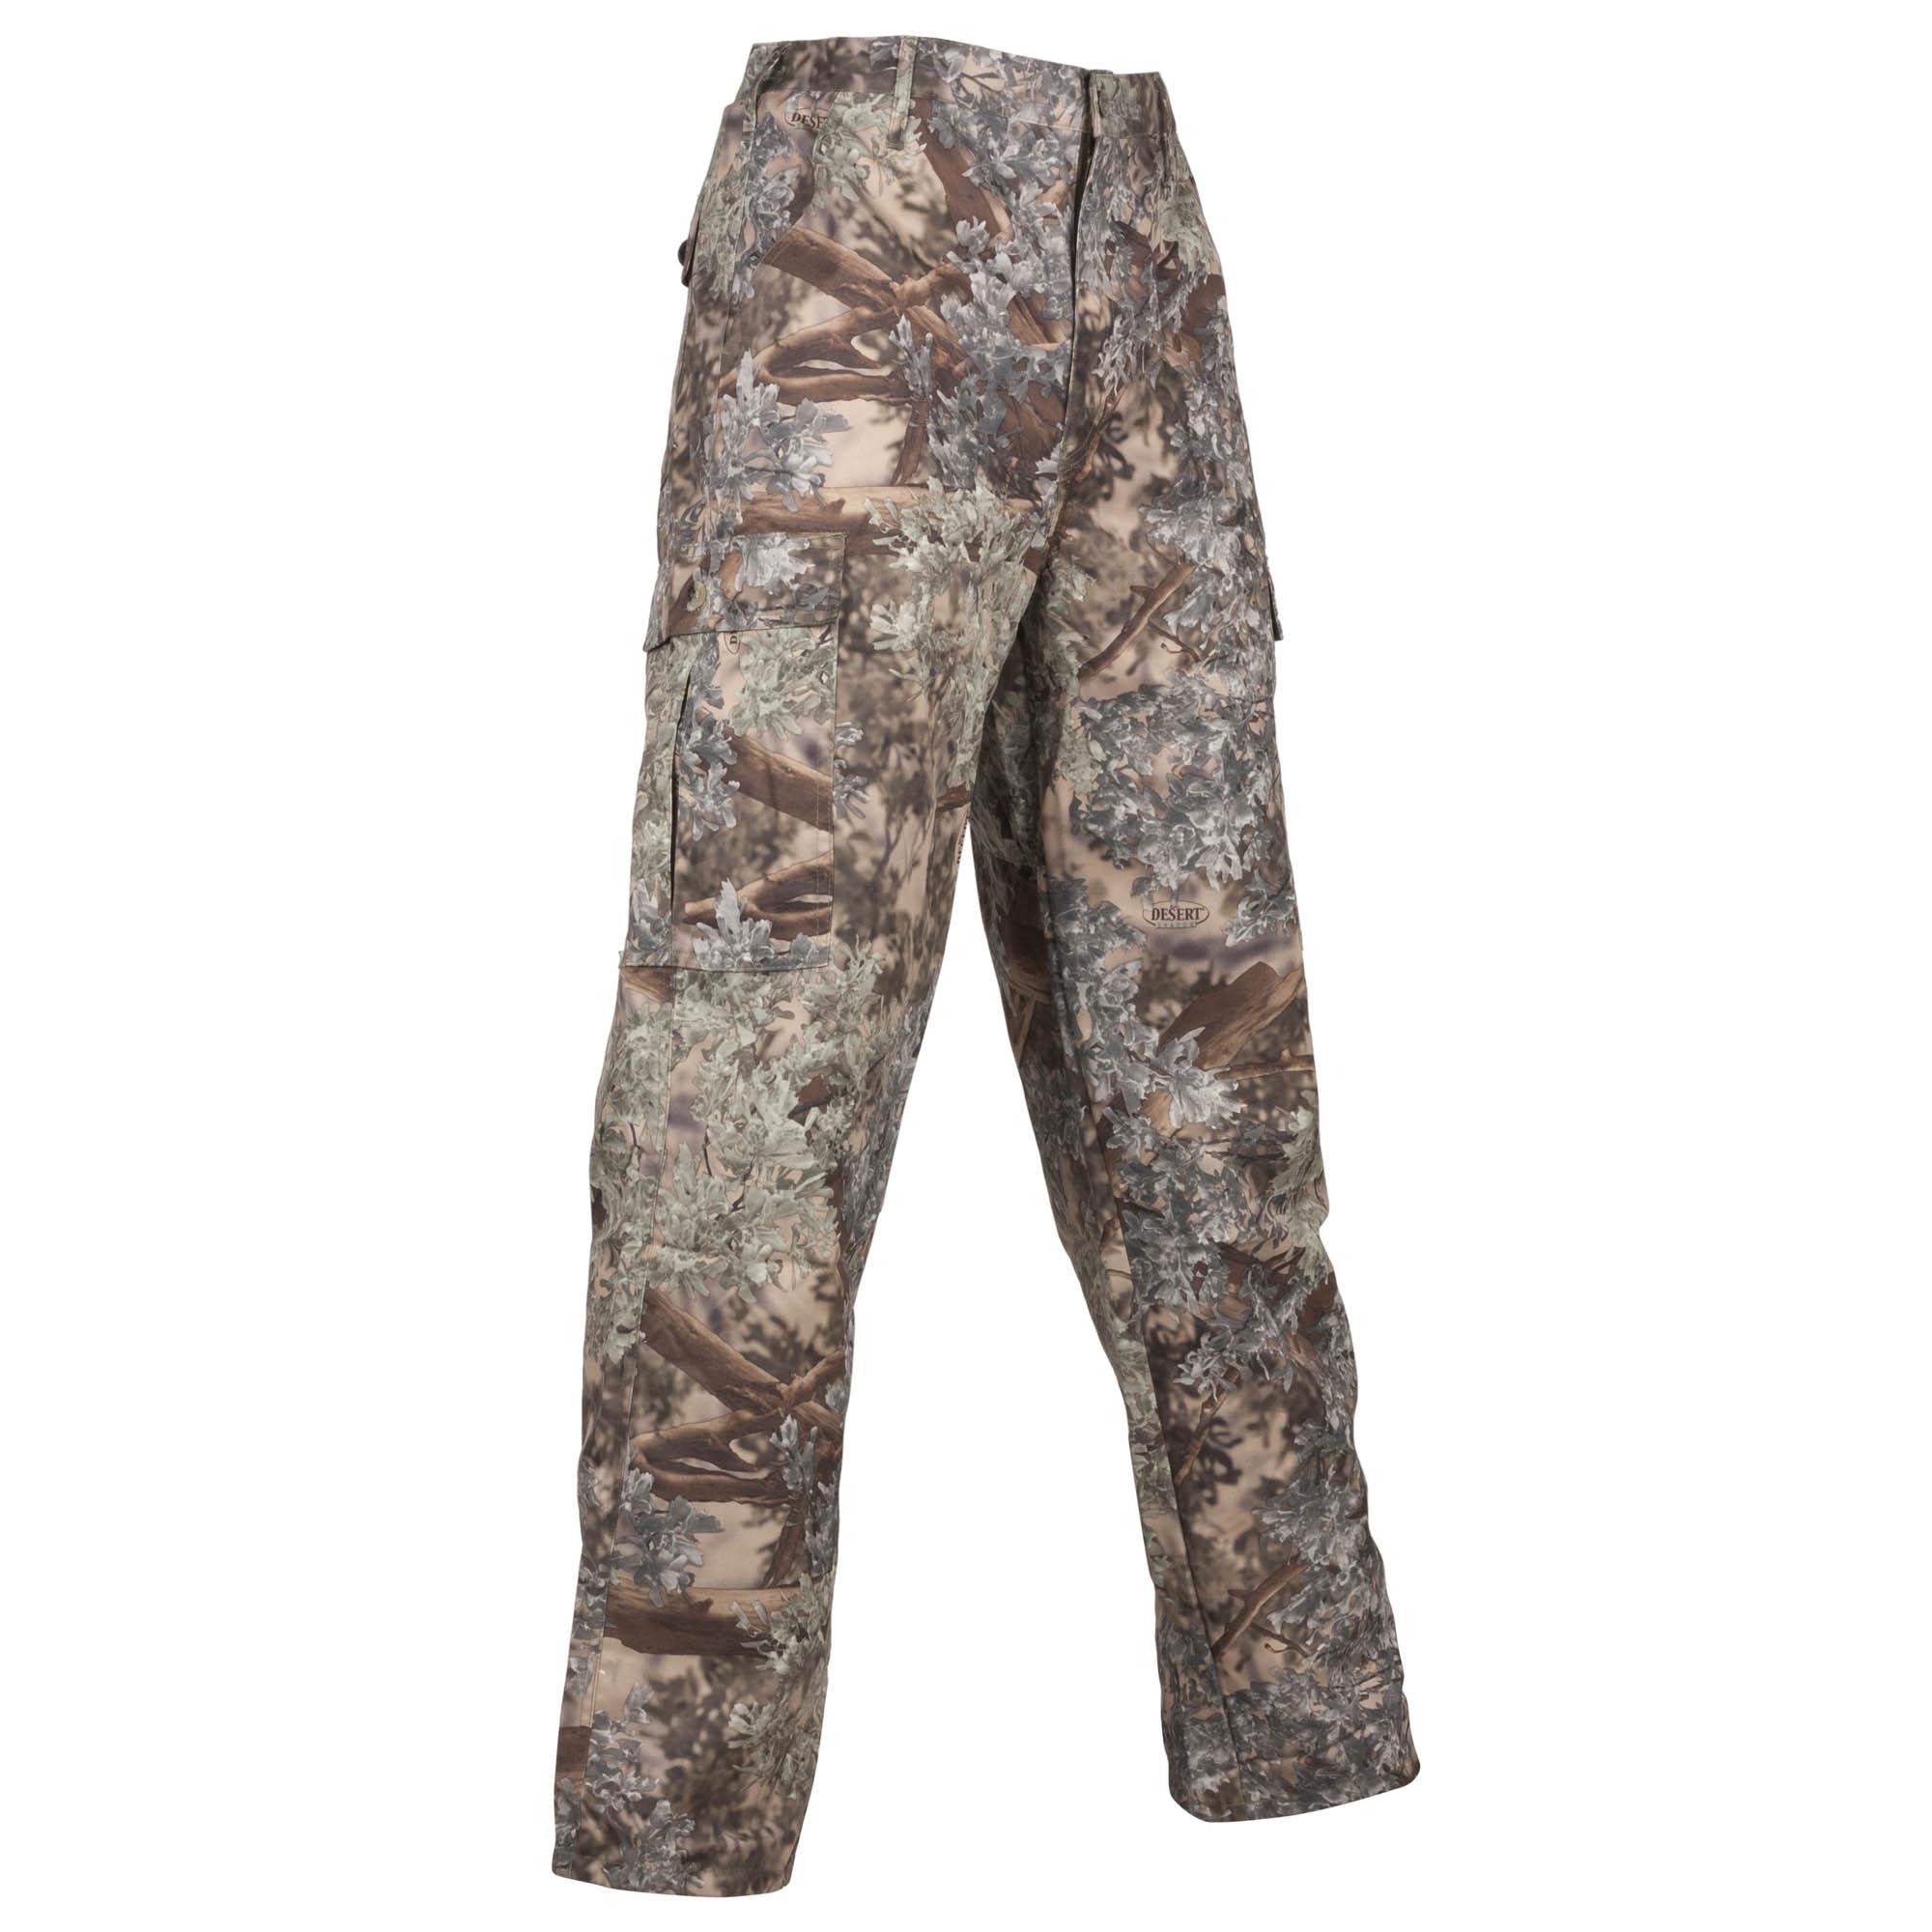 camo pants hunter series pants KUJLALR